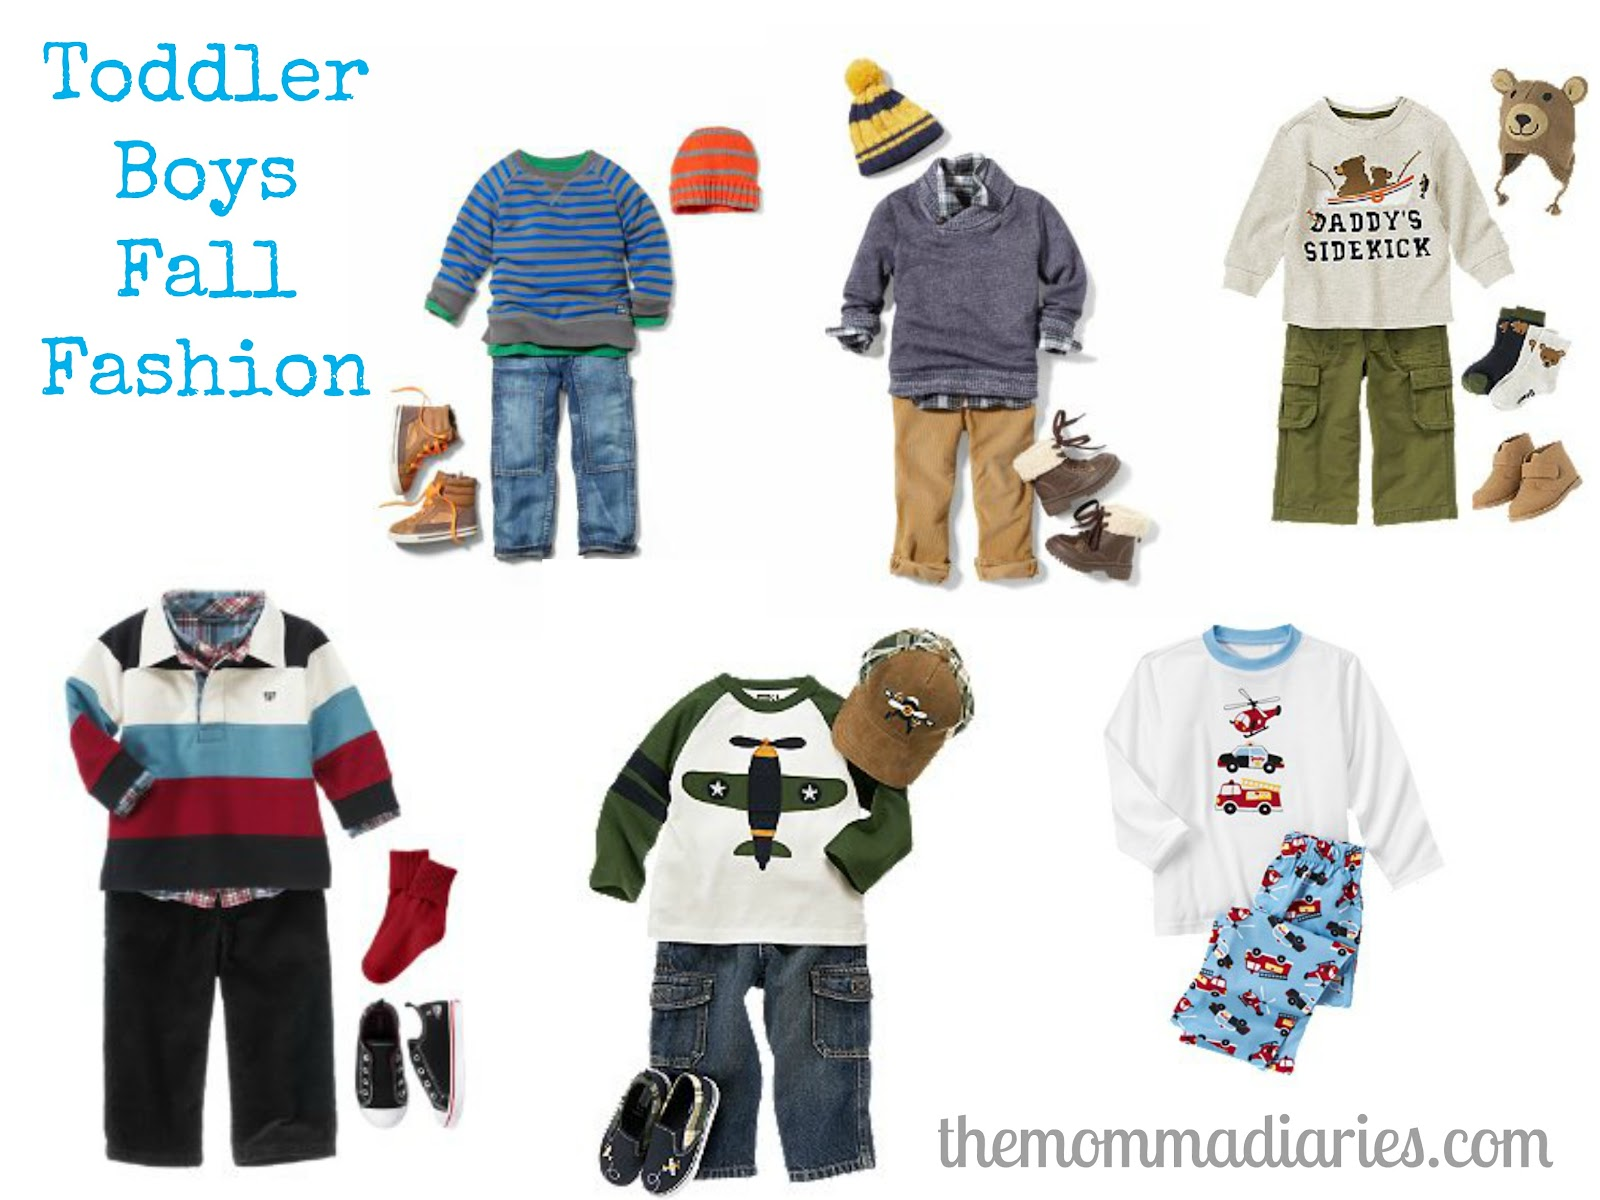 Toddler Boys Fall Fashion The Momma Diaries